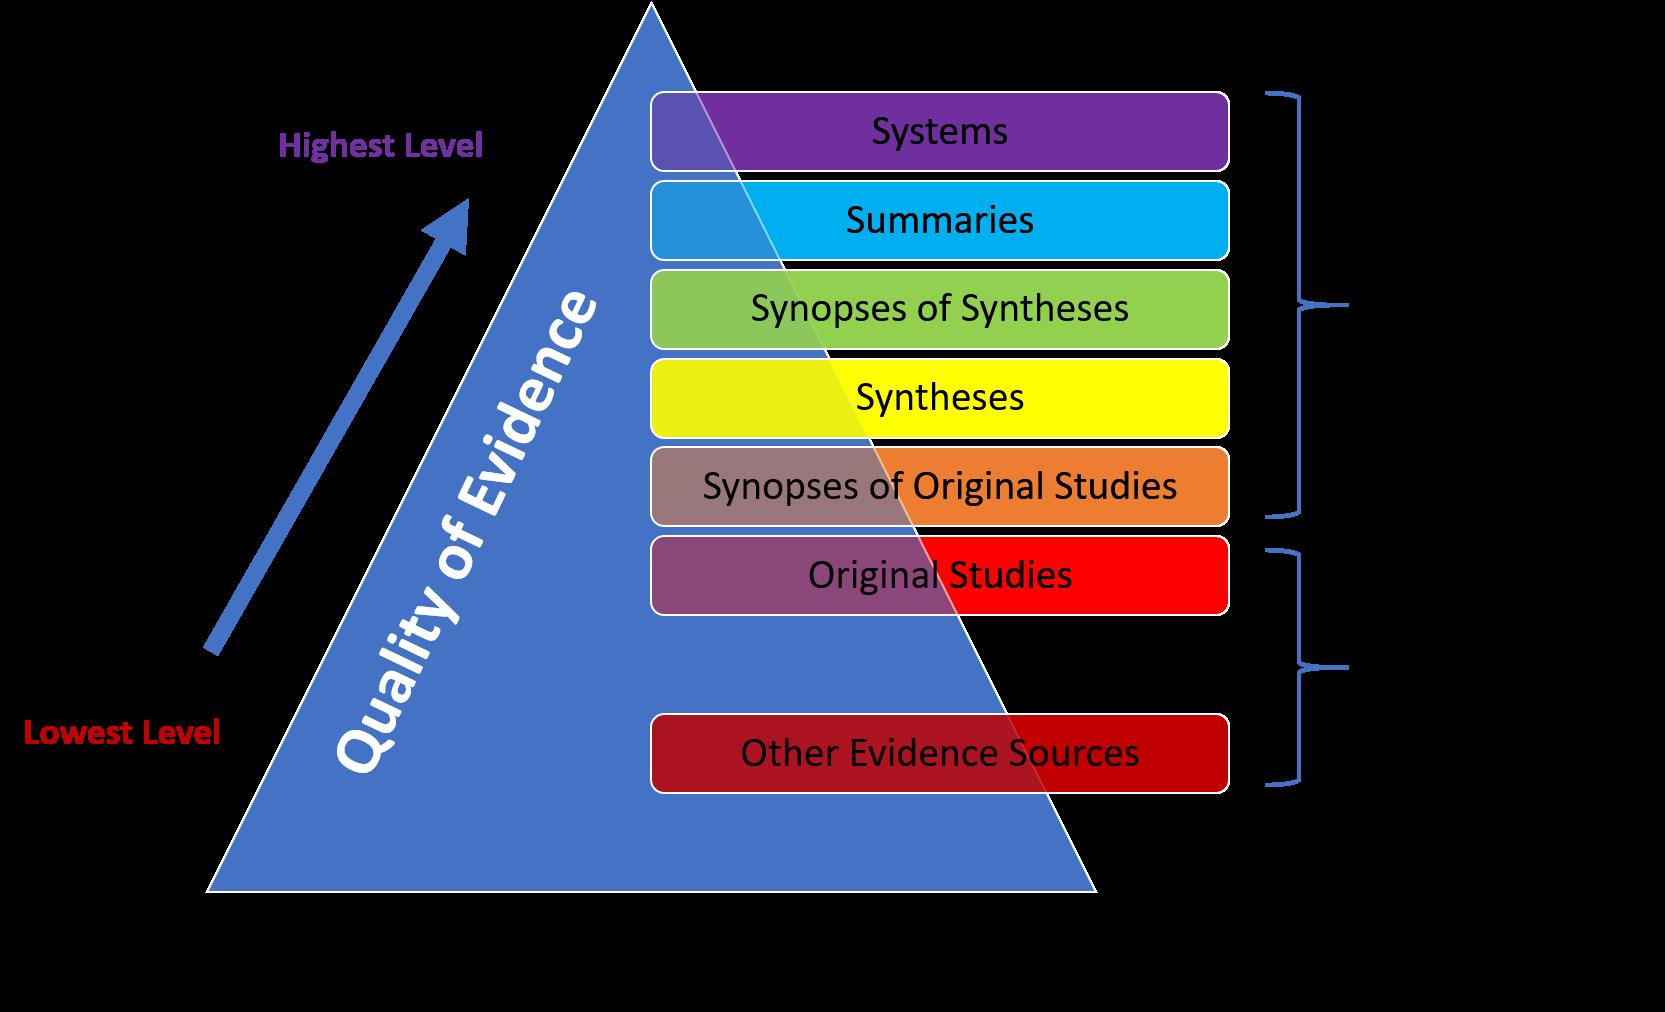 6spyramid 7levelscategories